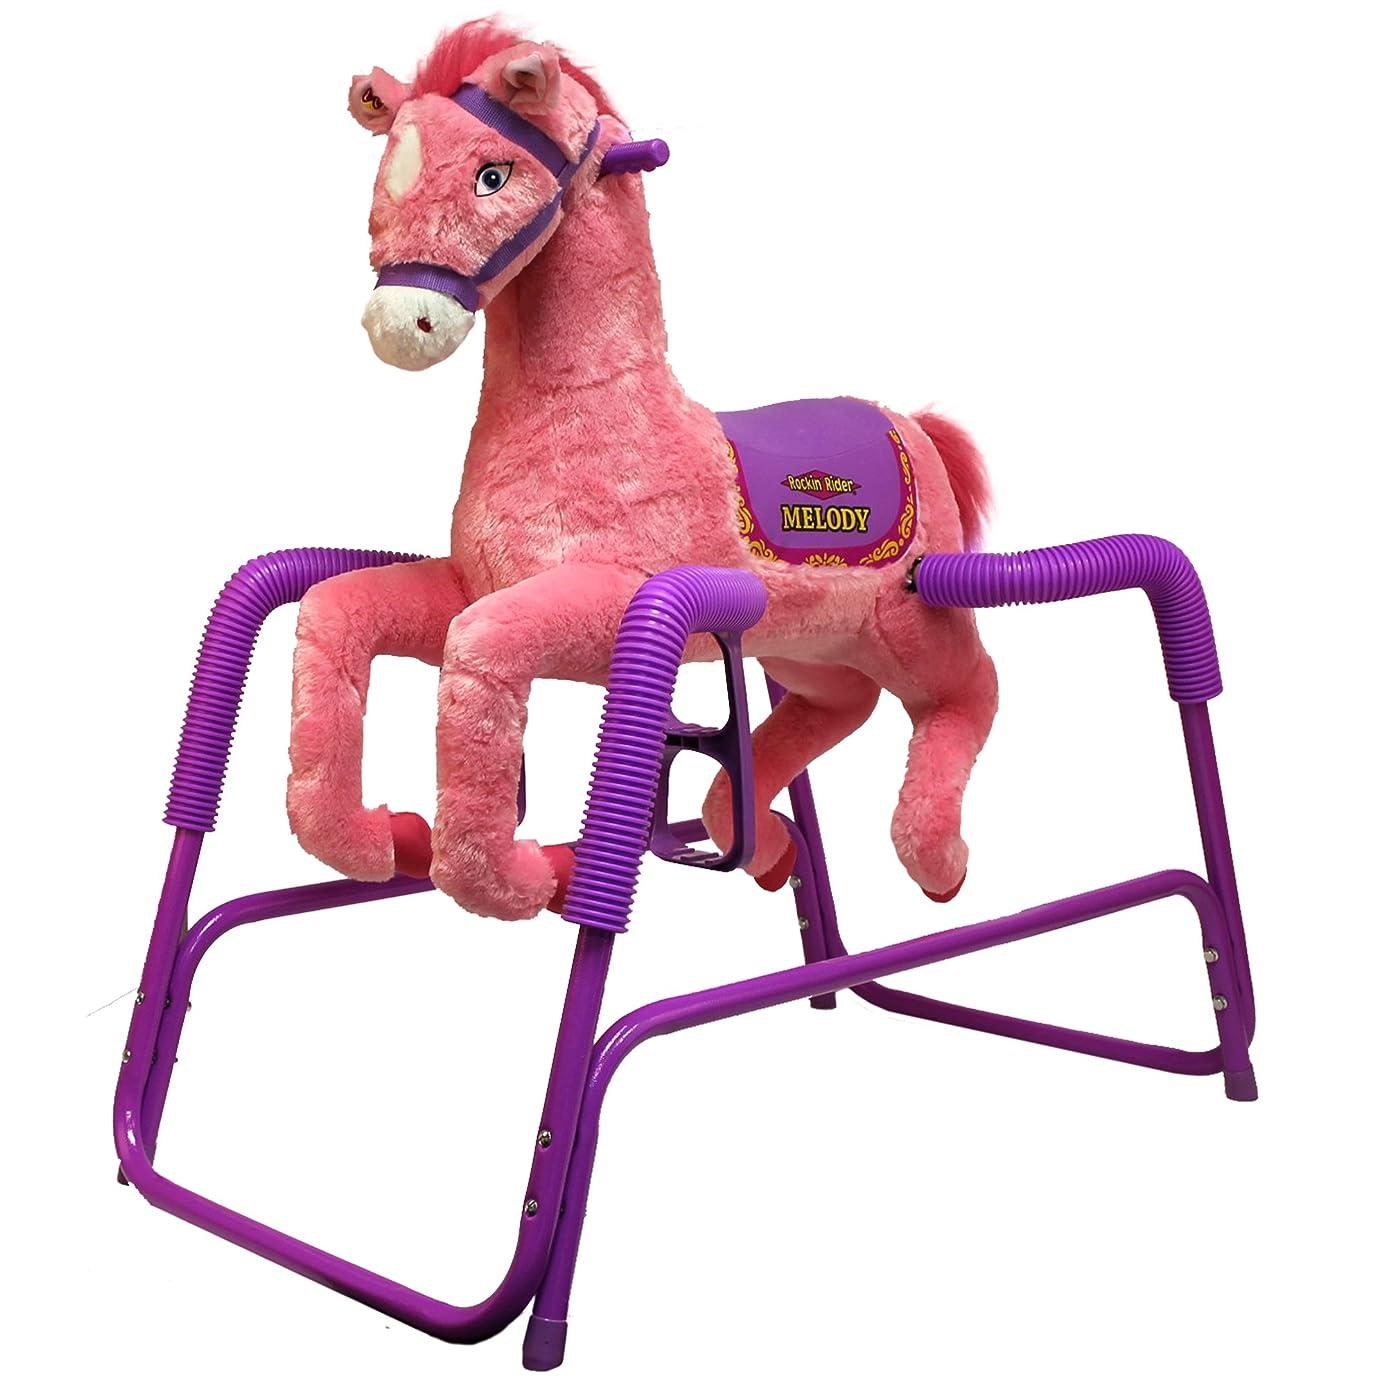 Rockin' Rider Melody Plush Spring Horse fiy2979331